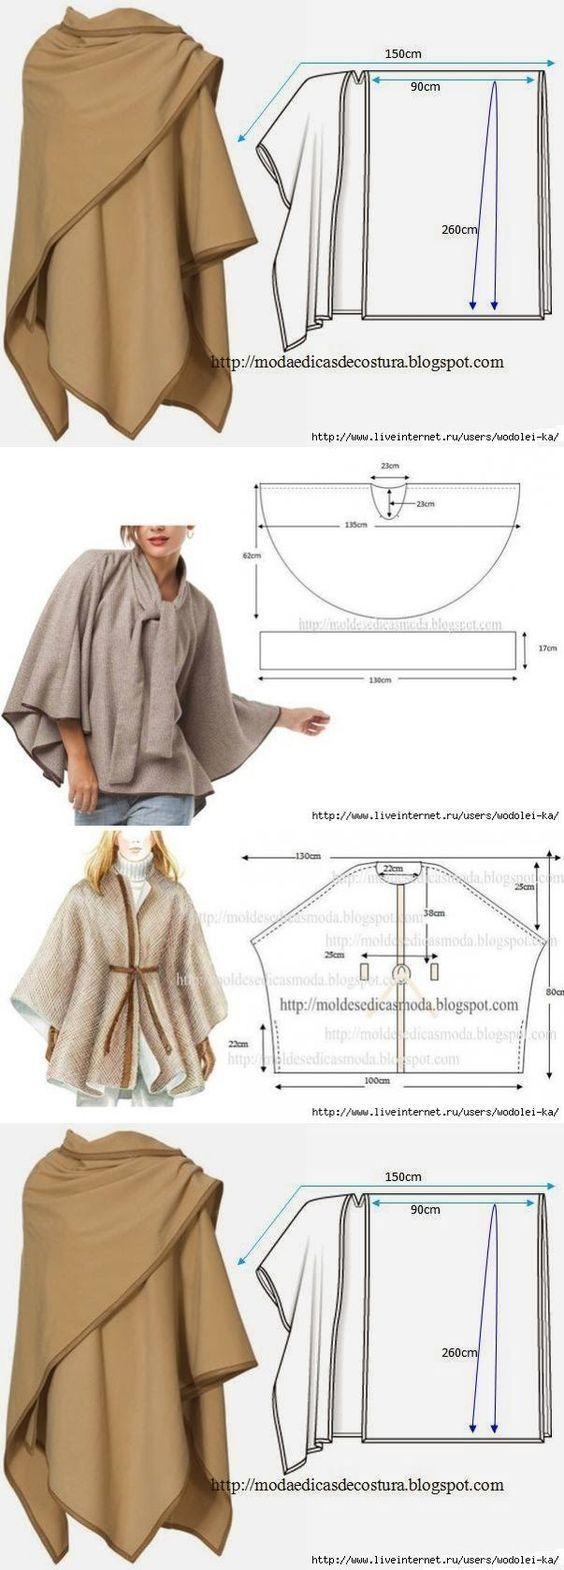 2180 besten Poncho Outfit Bilder auf Pinterest | Ponchos, Poncho ...